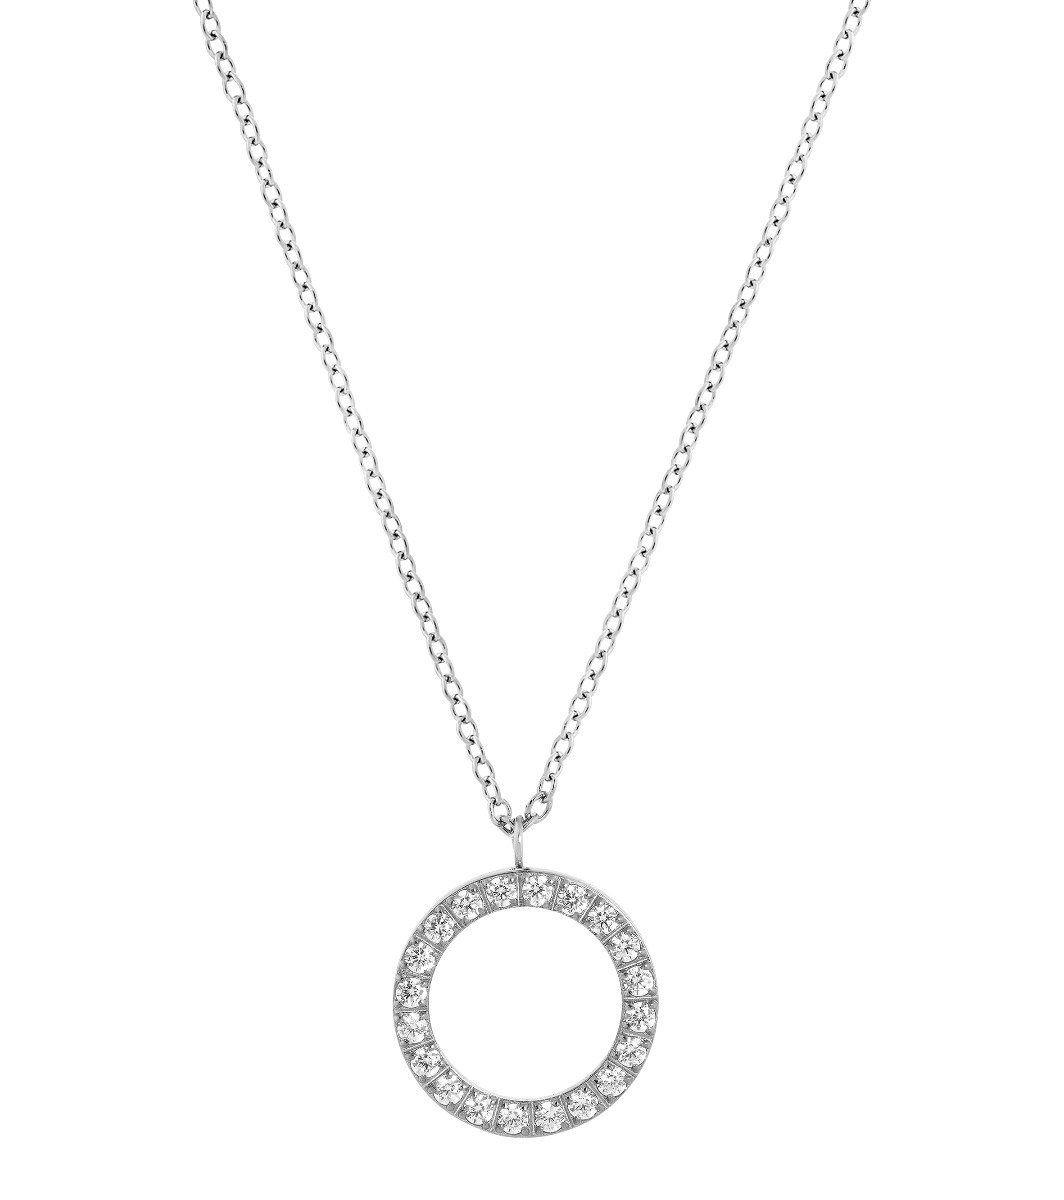 Edblad Glow Necklace Steel